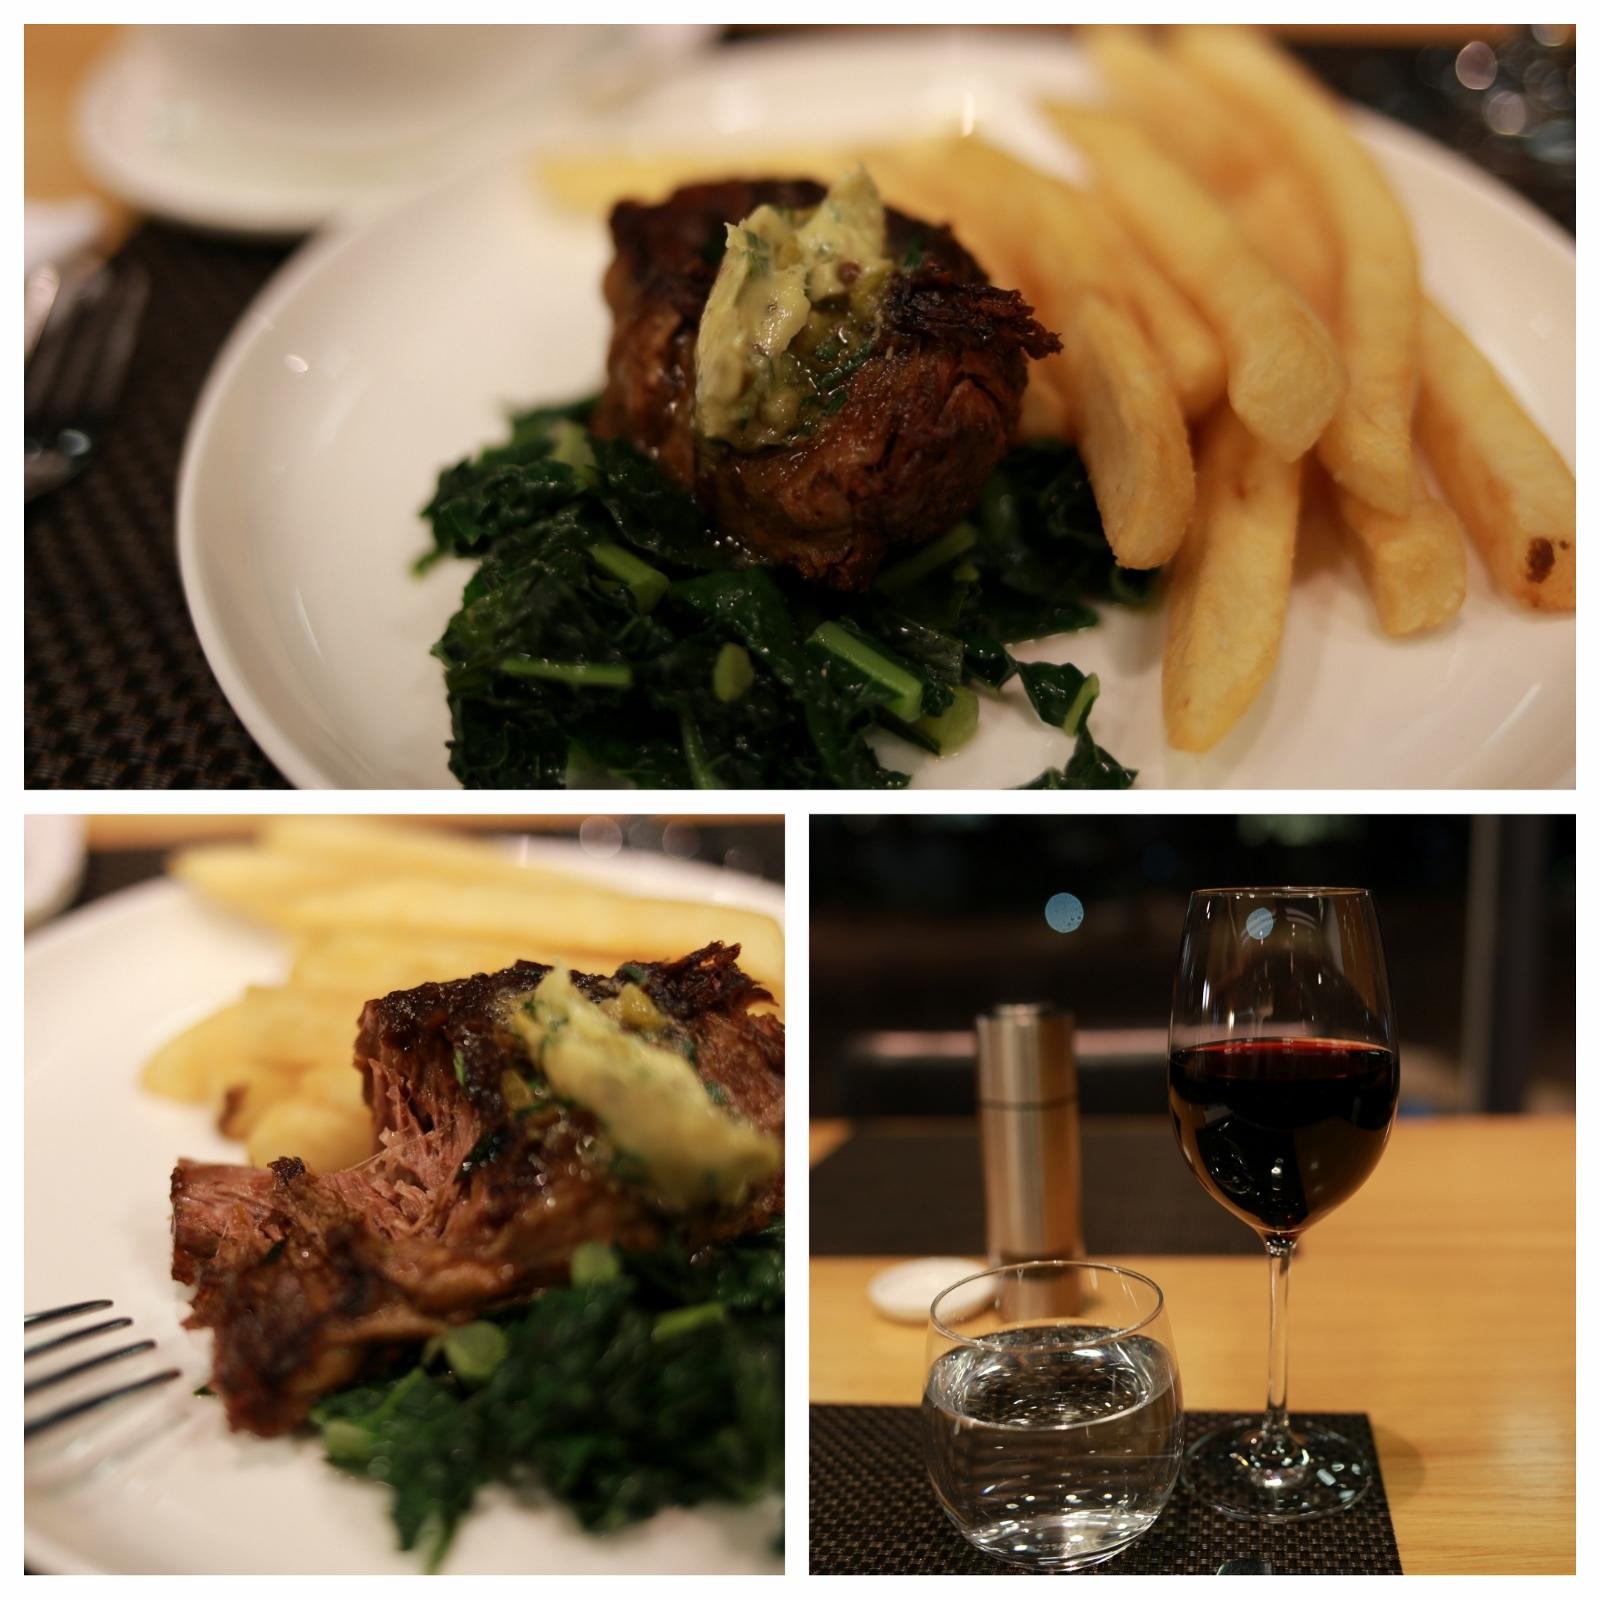 Mel_qf_first_dinner_1600x1600